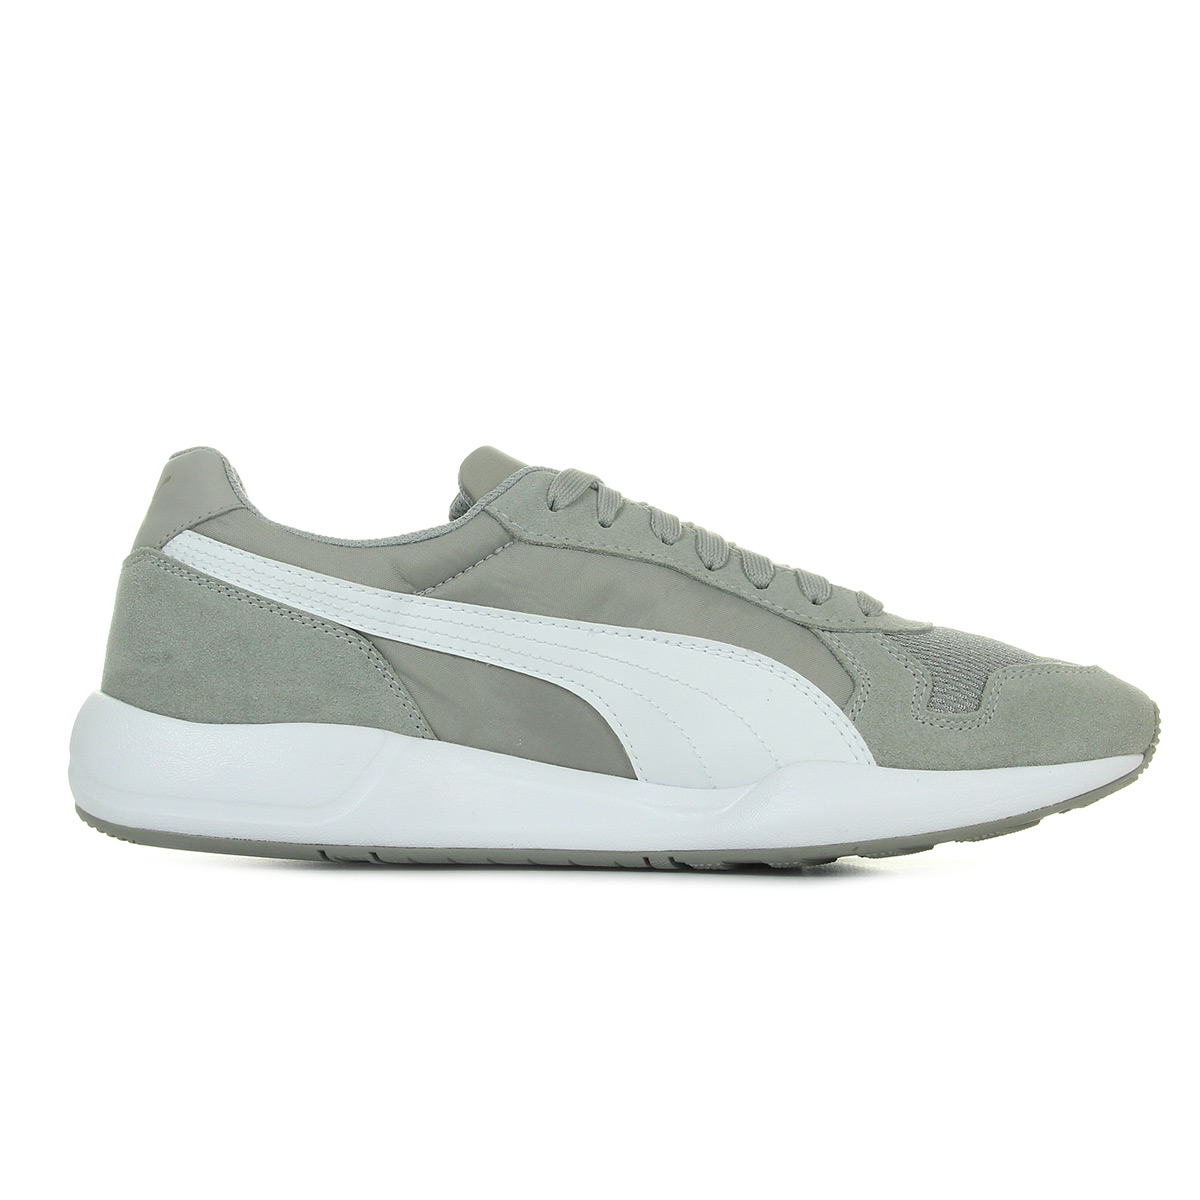 Puma St Runner Plus Limest 35987903, Baskets mode homme